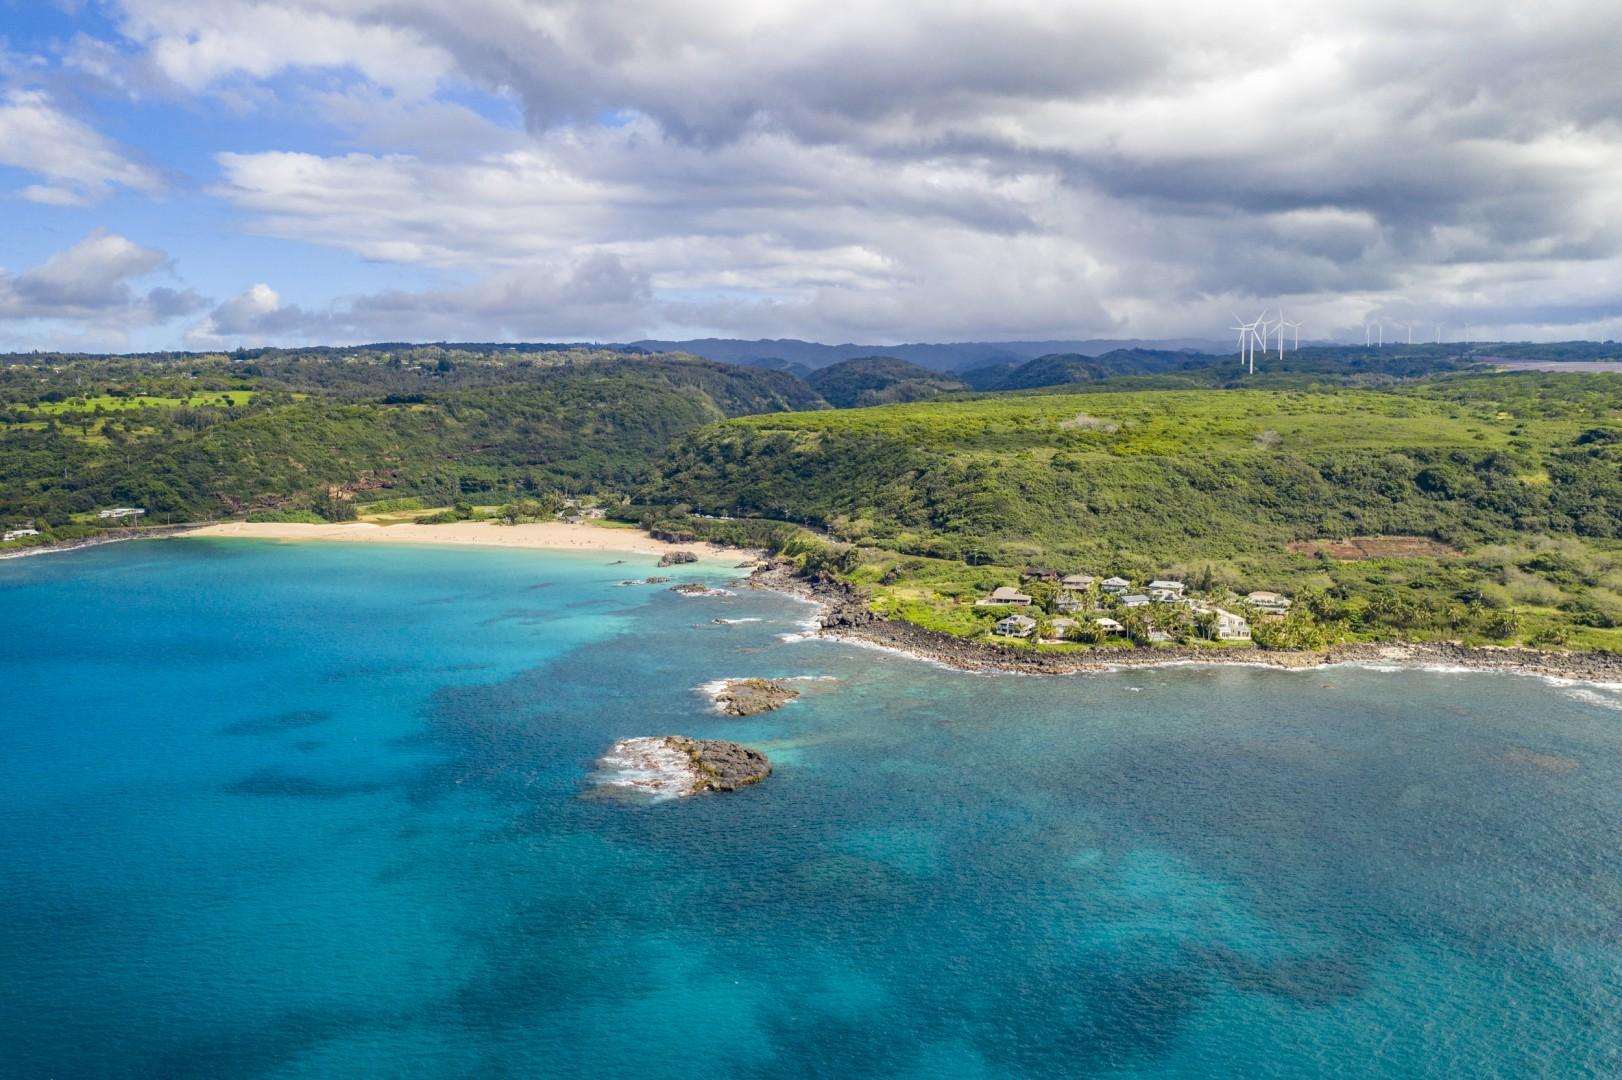 Postcard-perfect Waimea Bay.